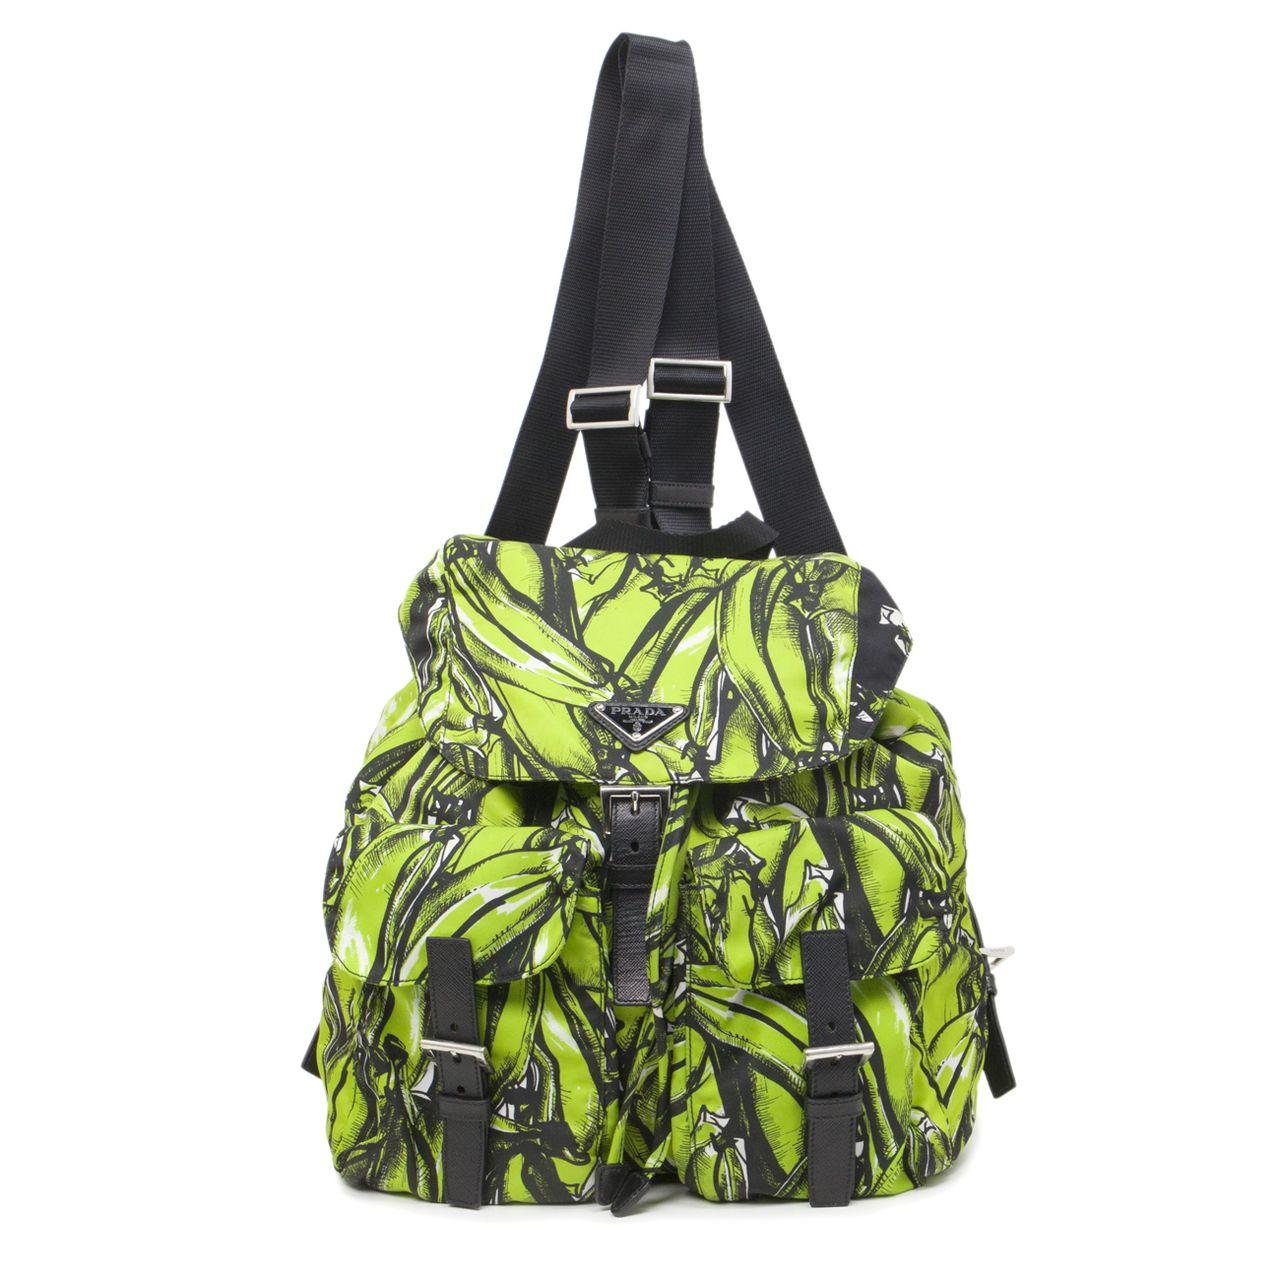 a1573d8df2cc24 Prada Green Tessuto Stampato Banana Print Backpack - modaselle ...